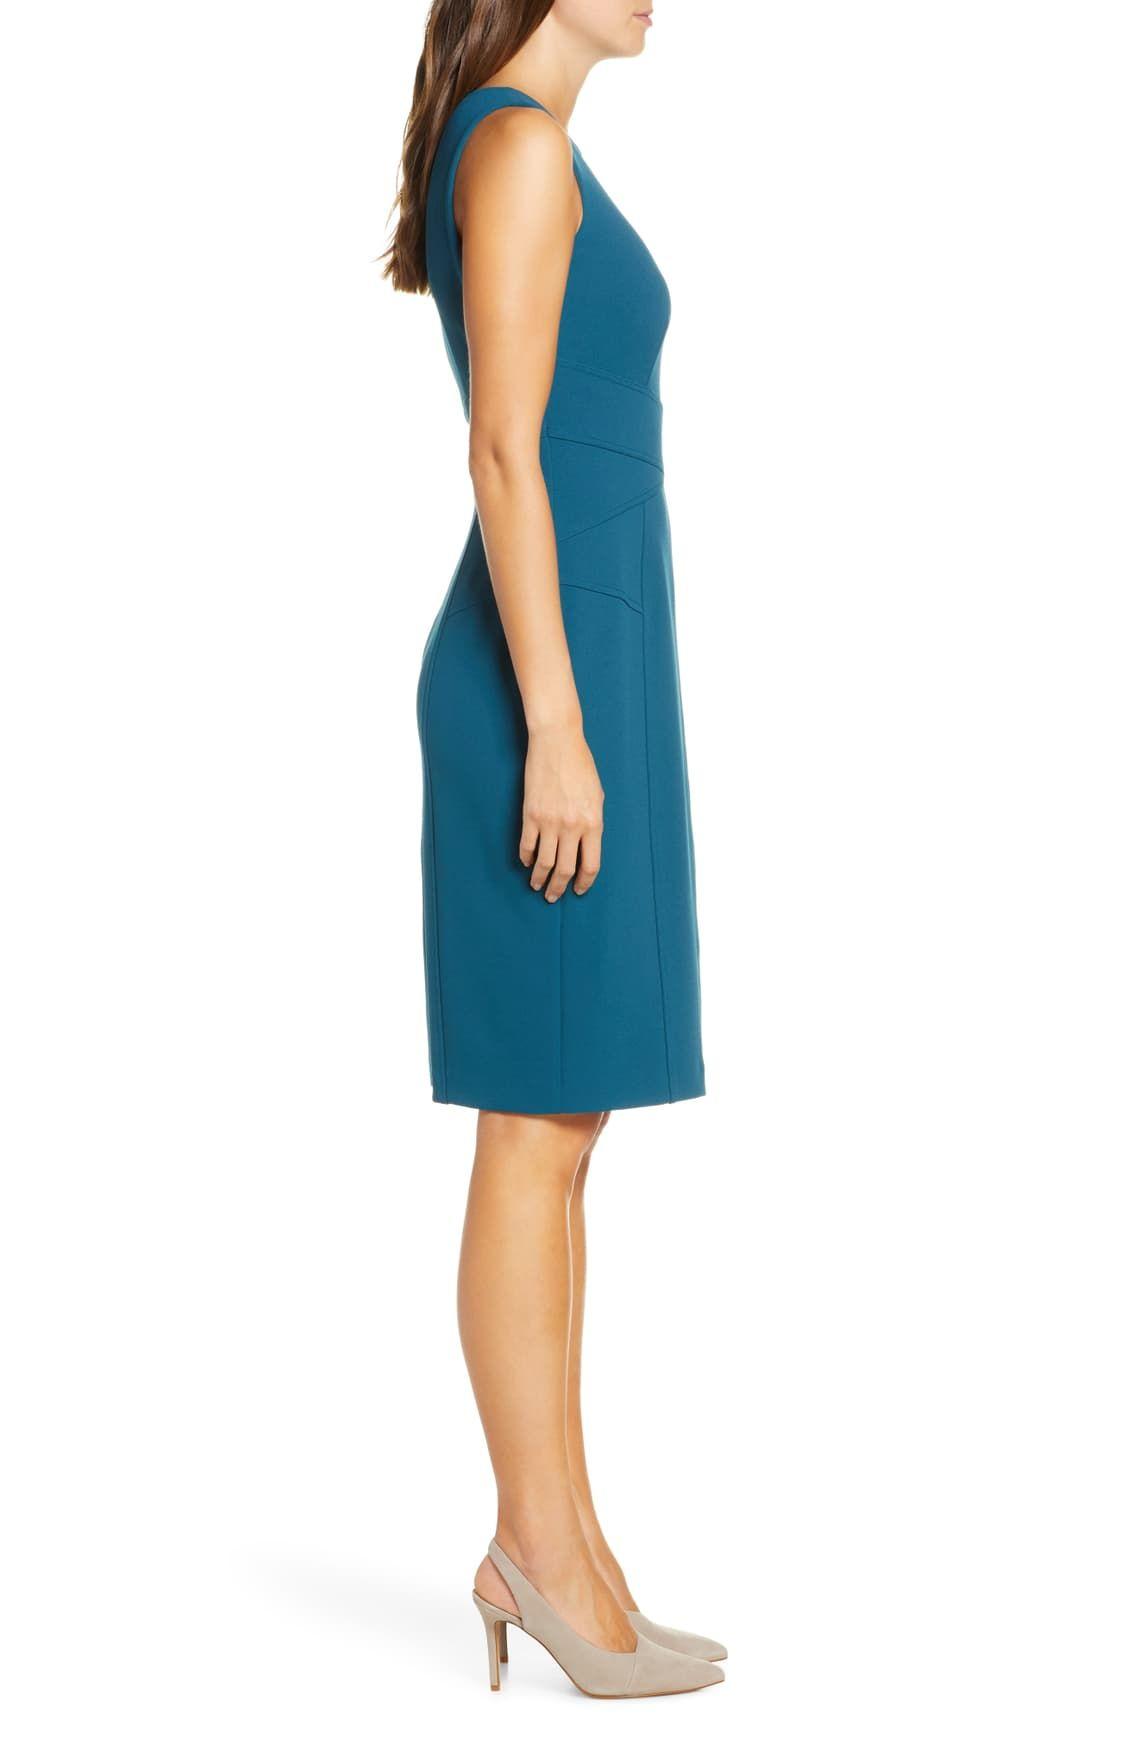 Vince Camuto Sleeveless Crepe Sheath Dress Nordstrom Dresses Sheath Dress Nordstrom Dresses [ 1746 x 1140 Pixel ]